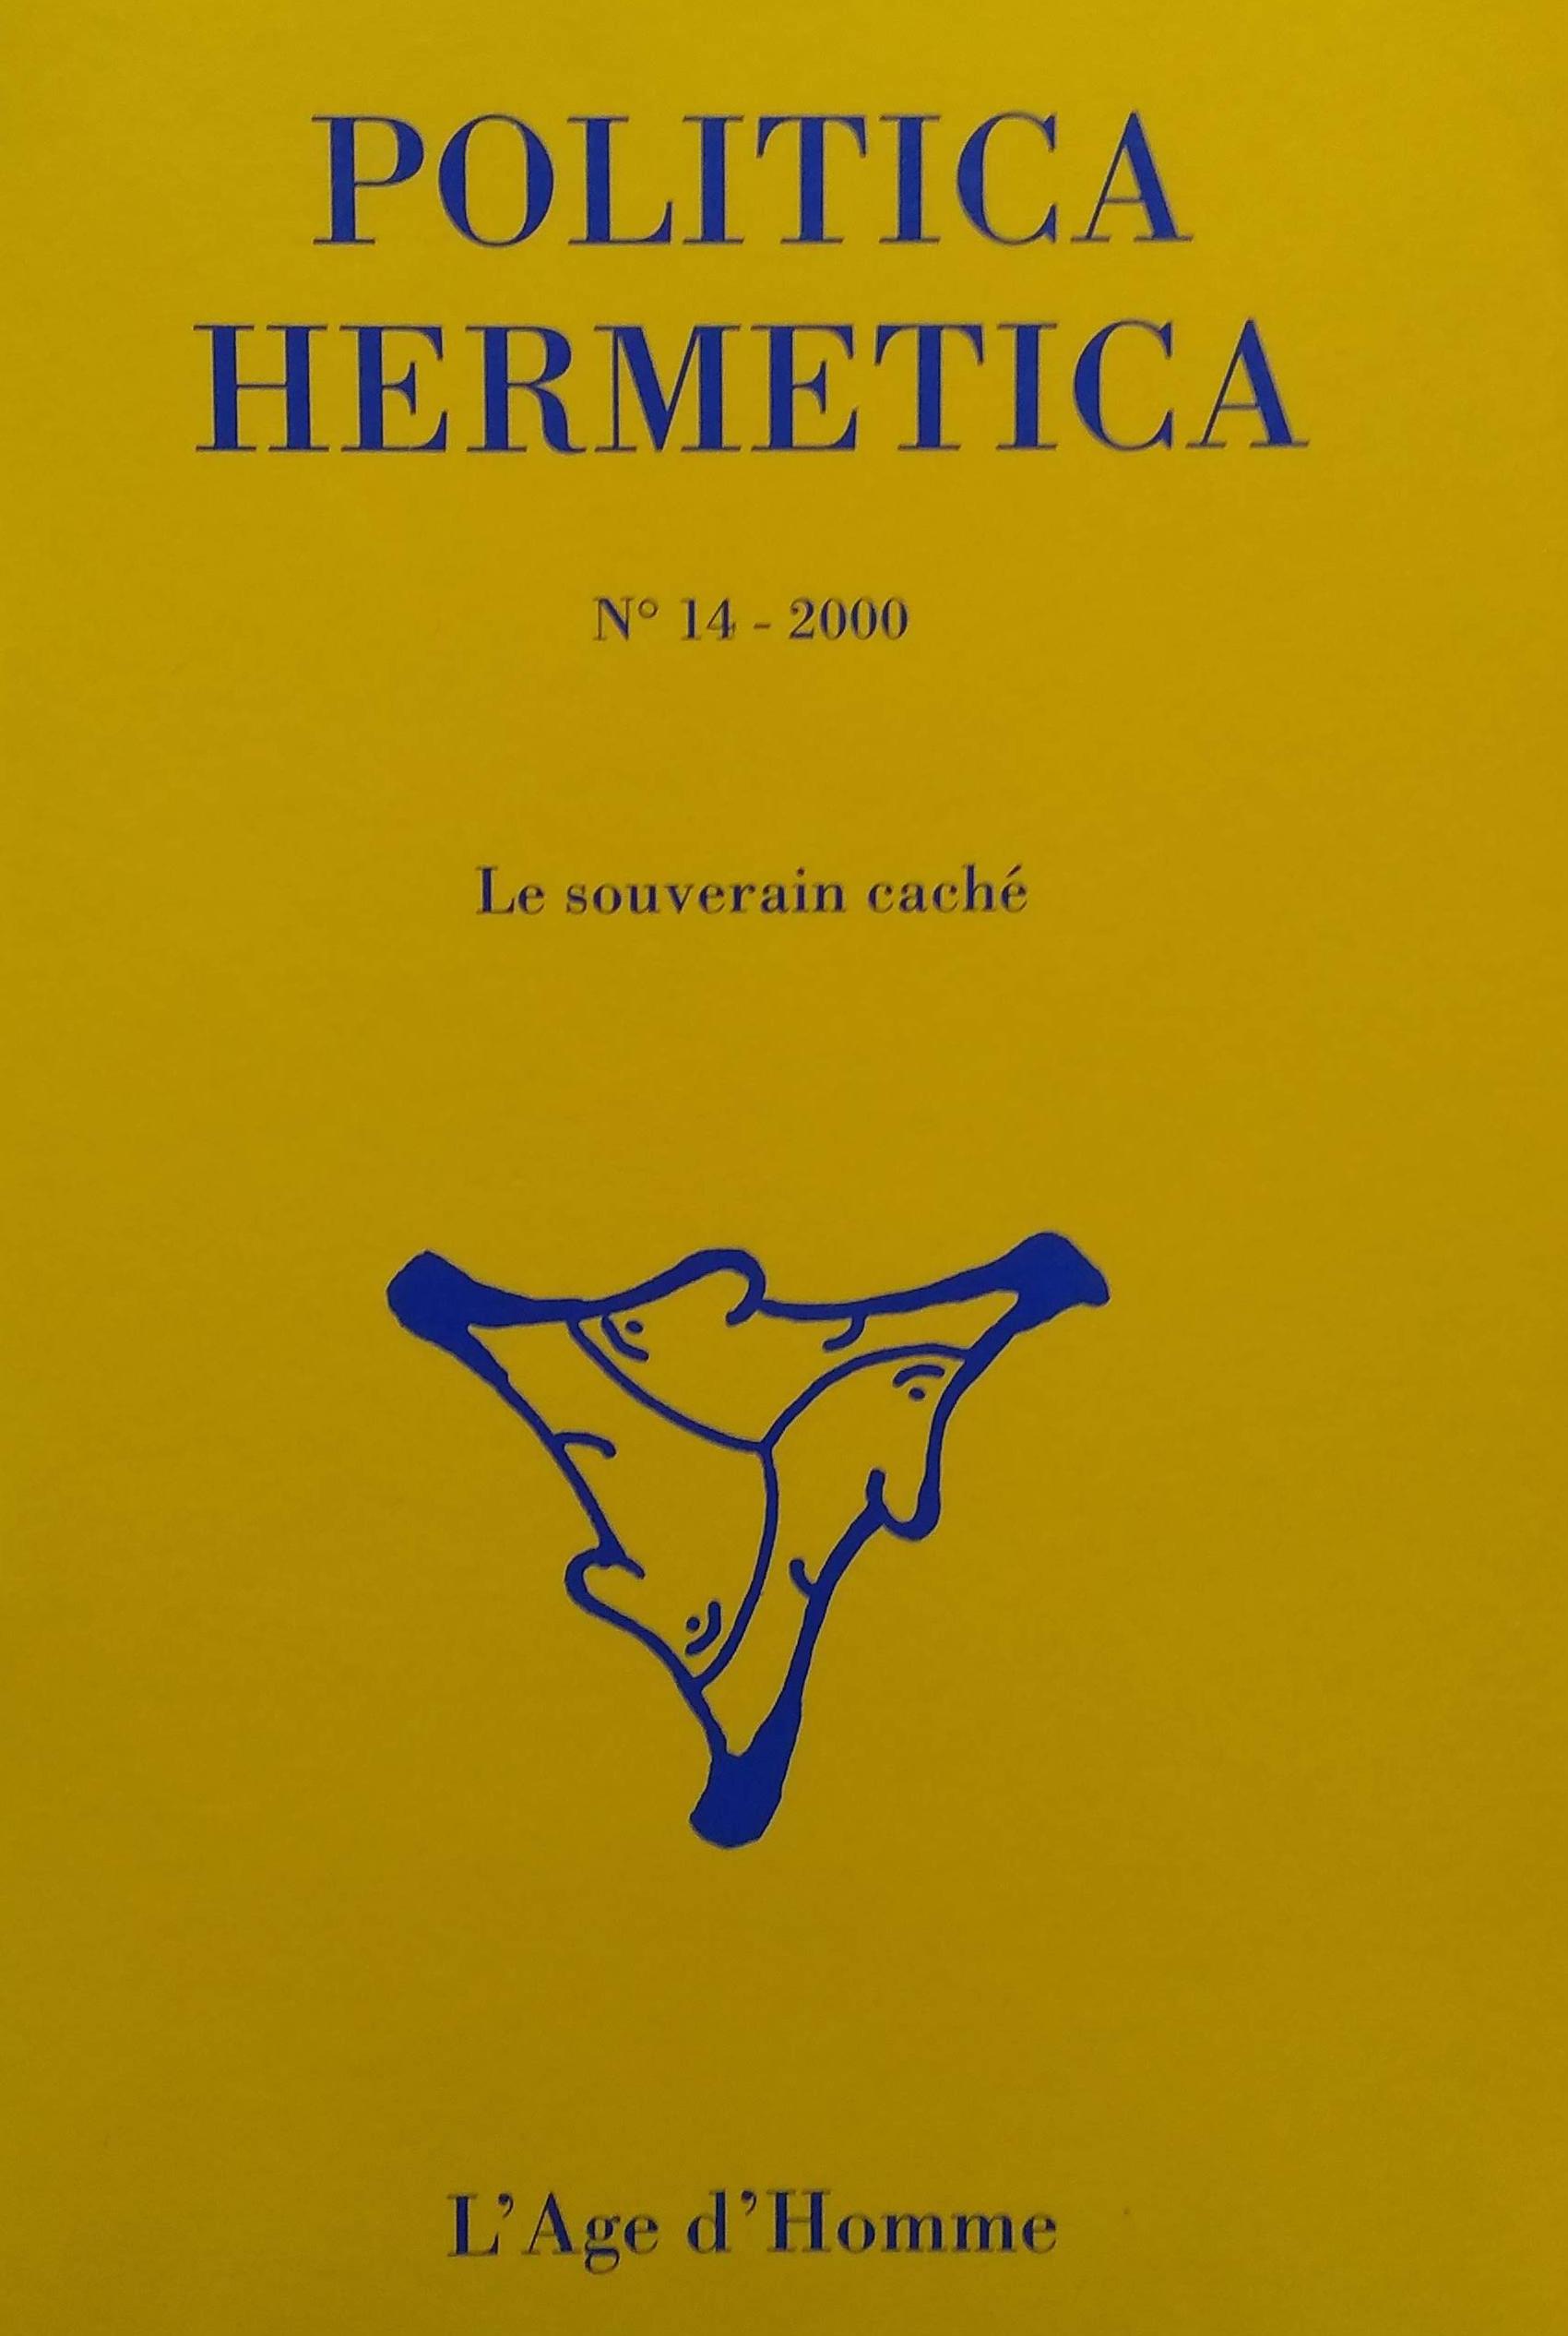 Politica Hermetica